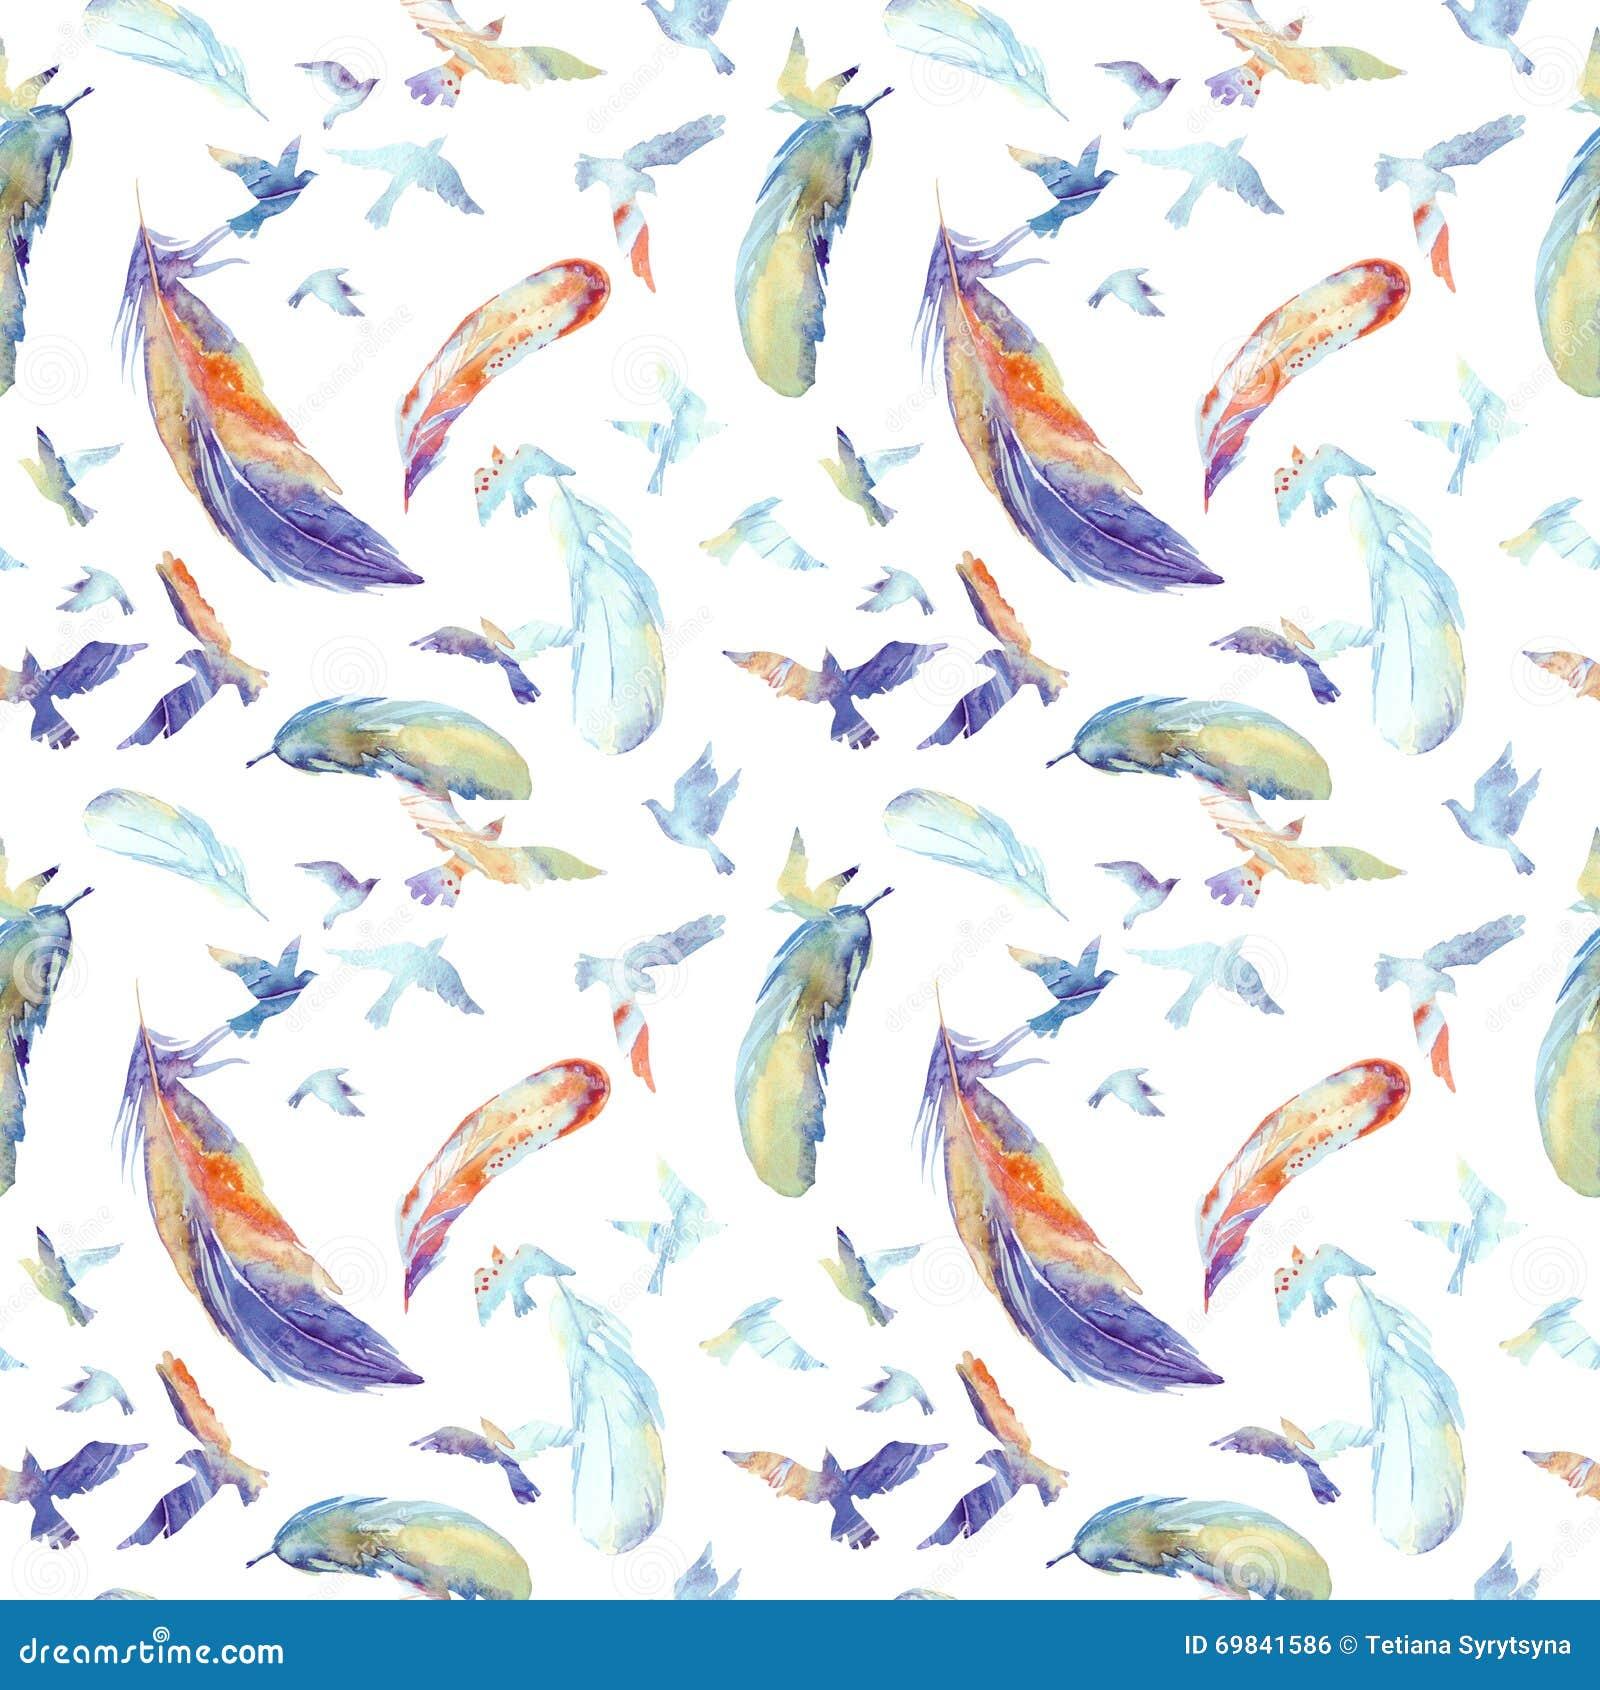 Blue Marble Polka Dot Watercolor Pattern Royalty Free